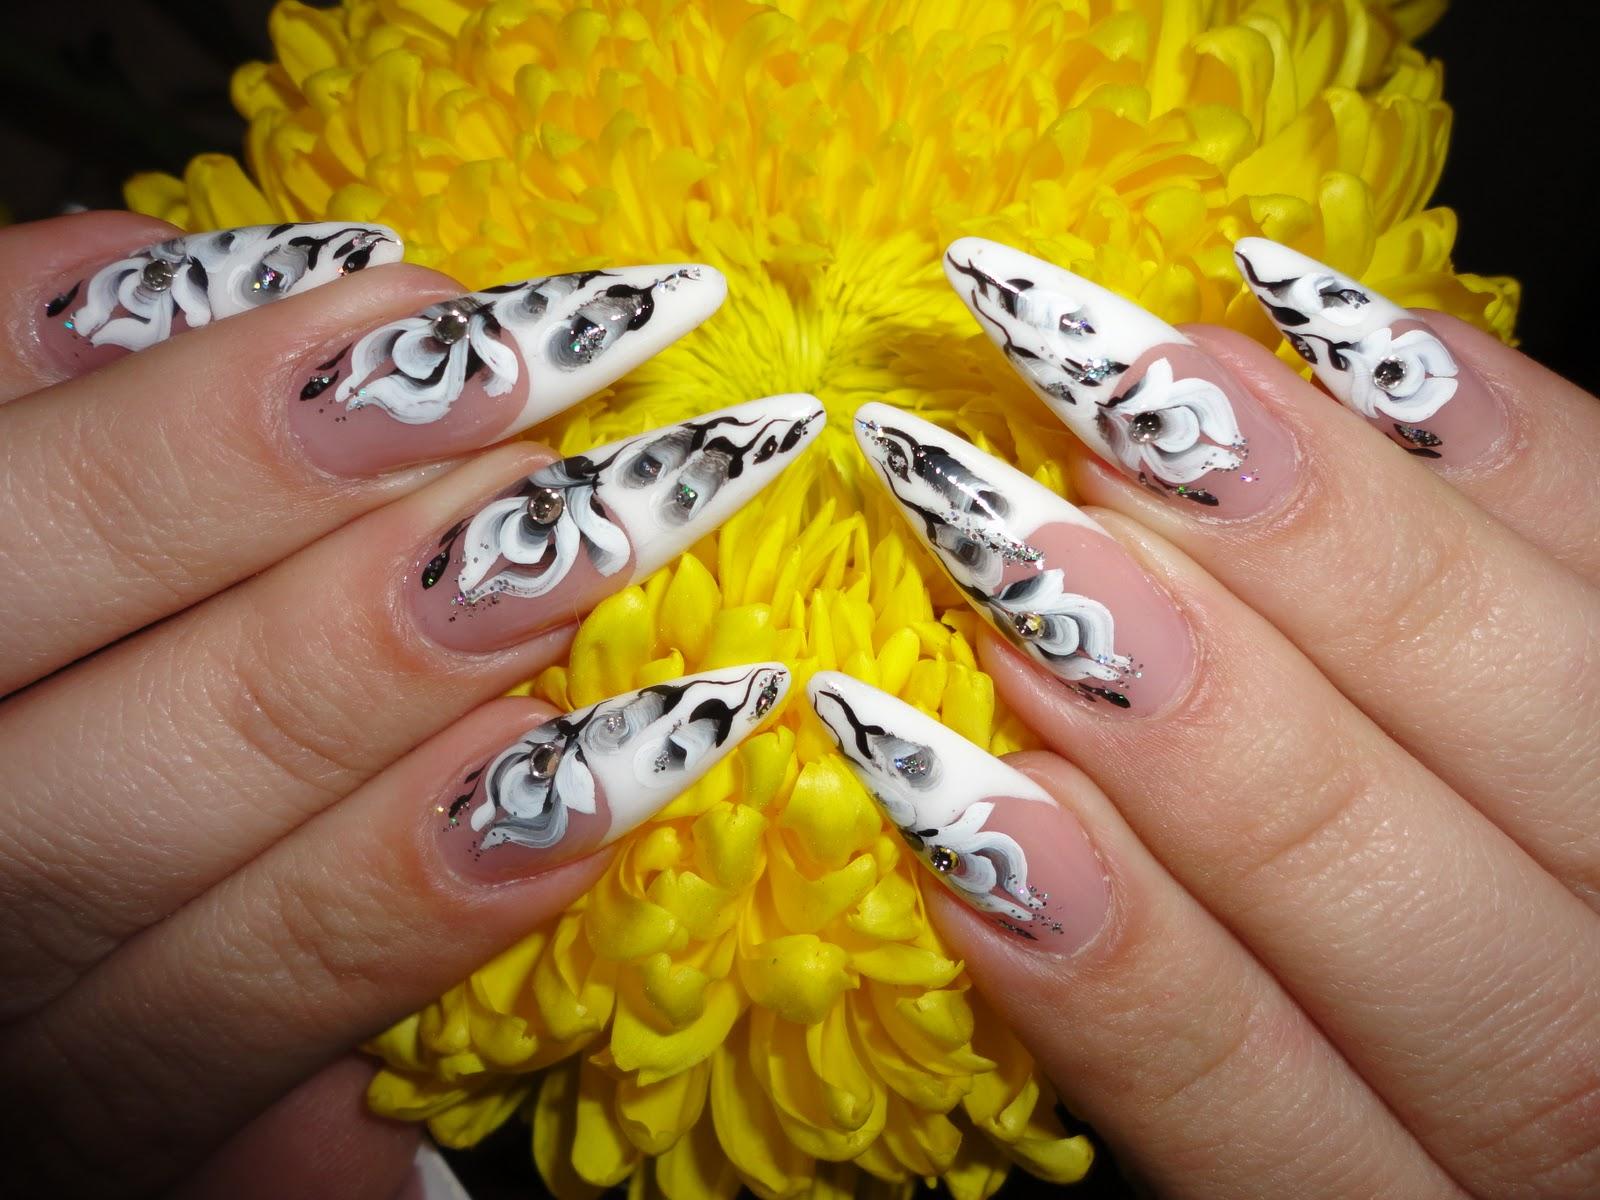 Рисунки на ногтях в домашних условиях 21 фотография